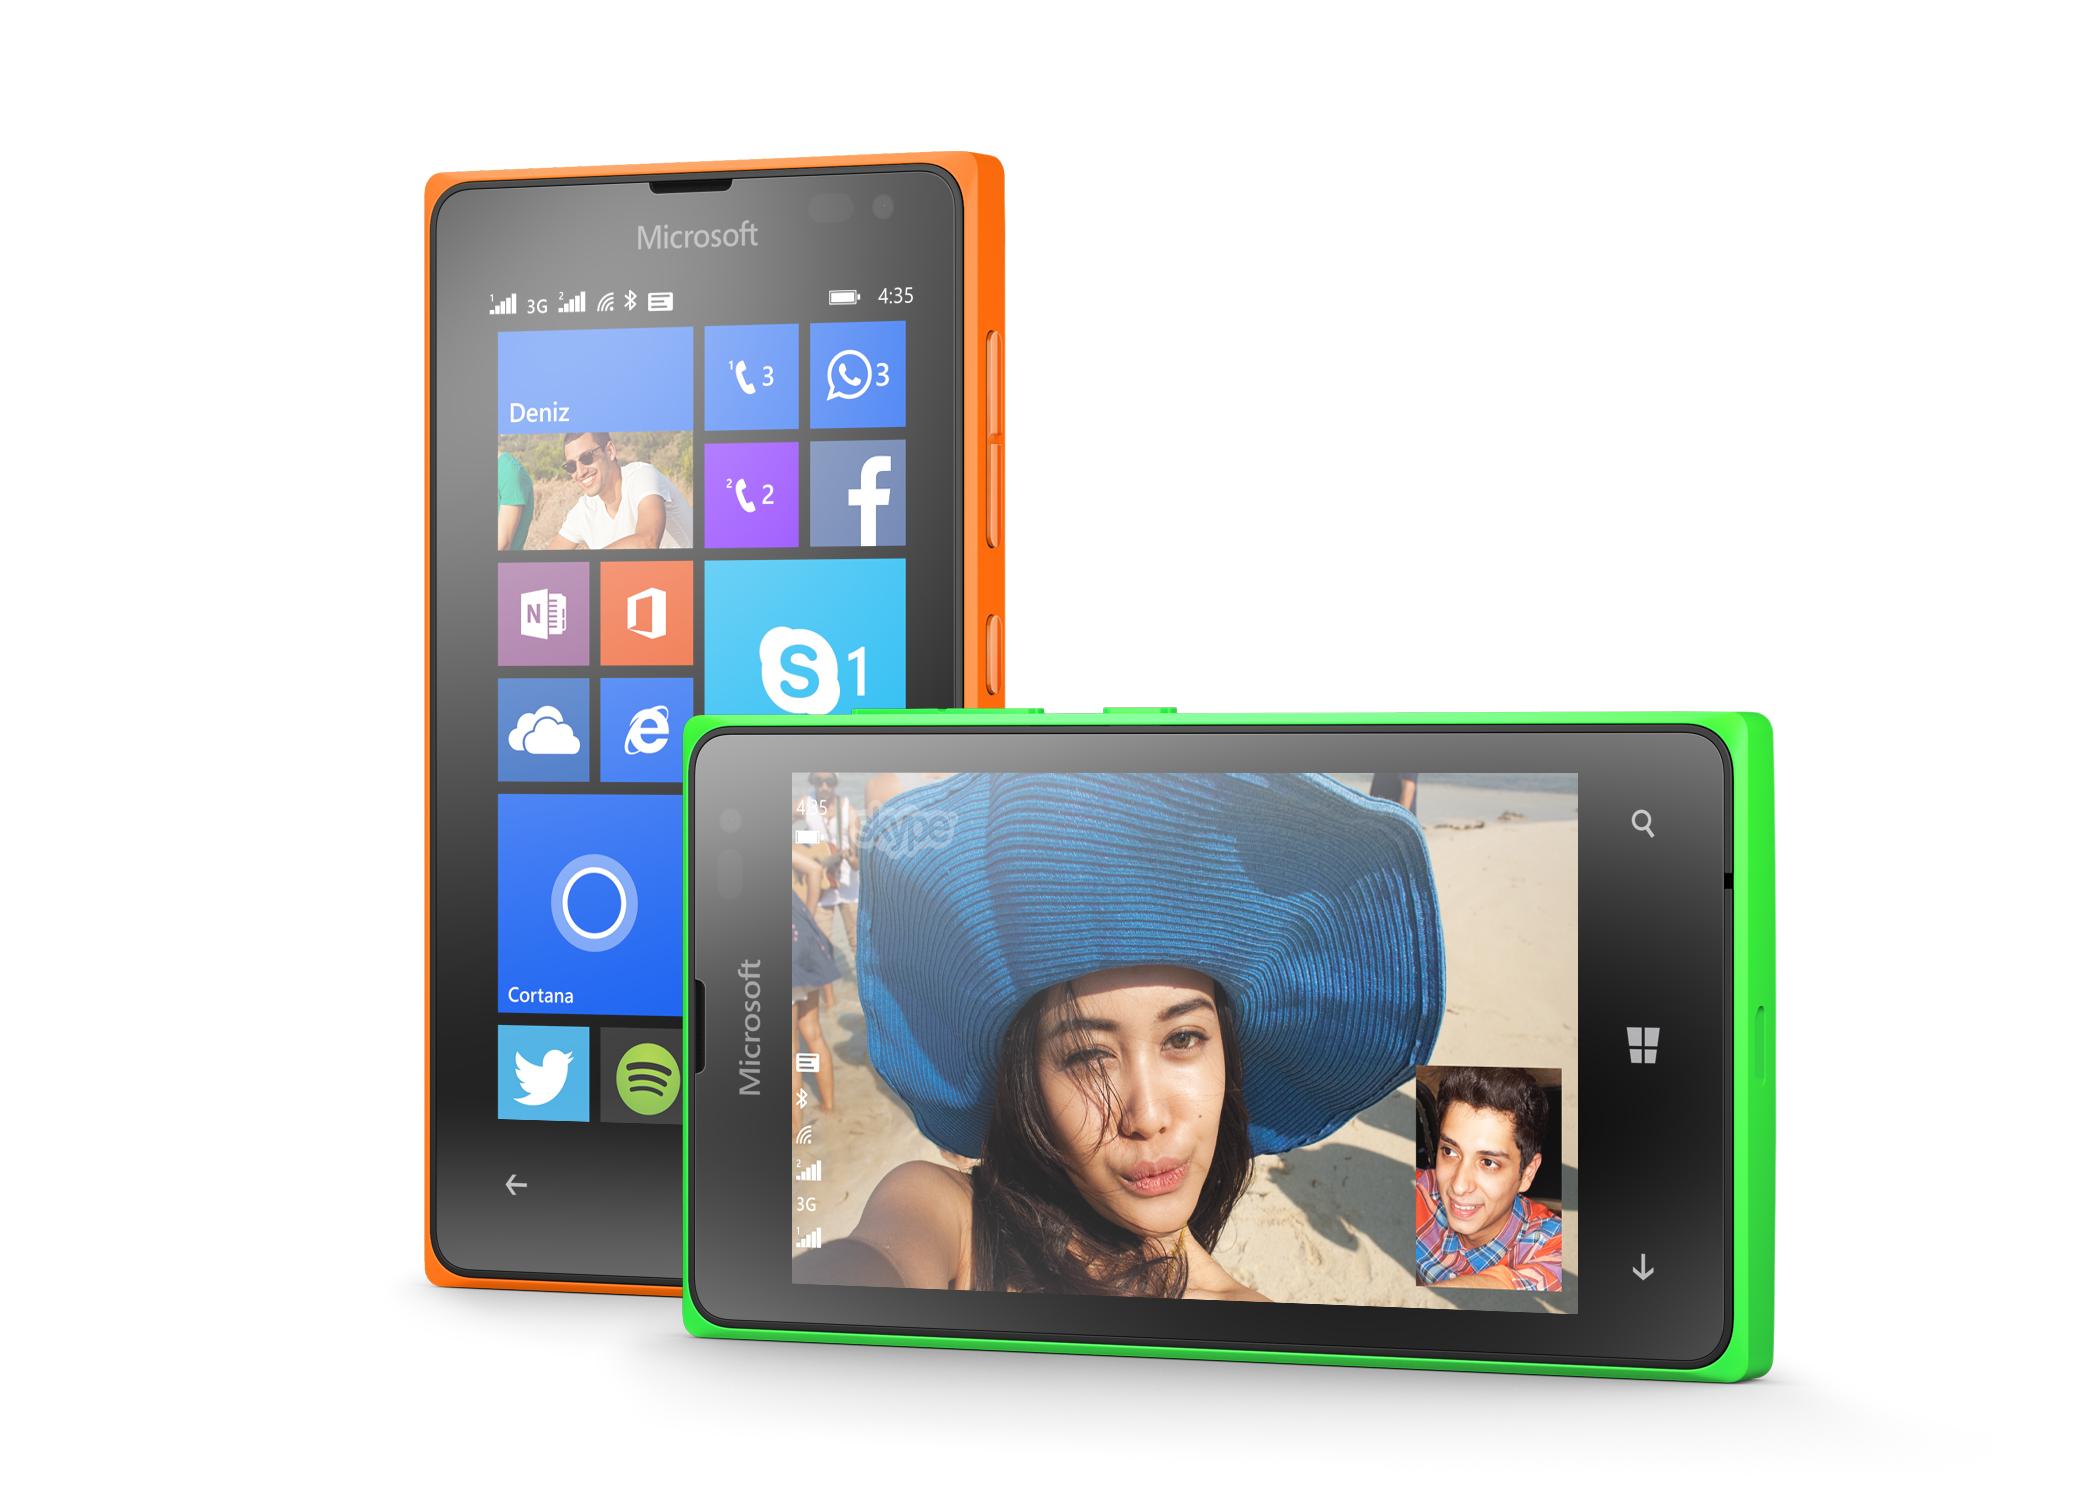 Microsoft's New Windows Phones Cost Under $100